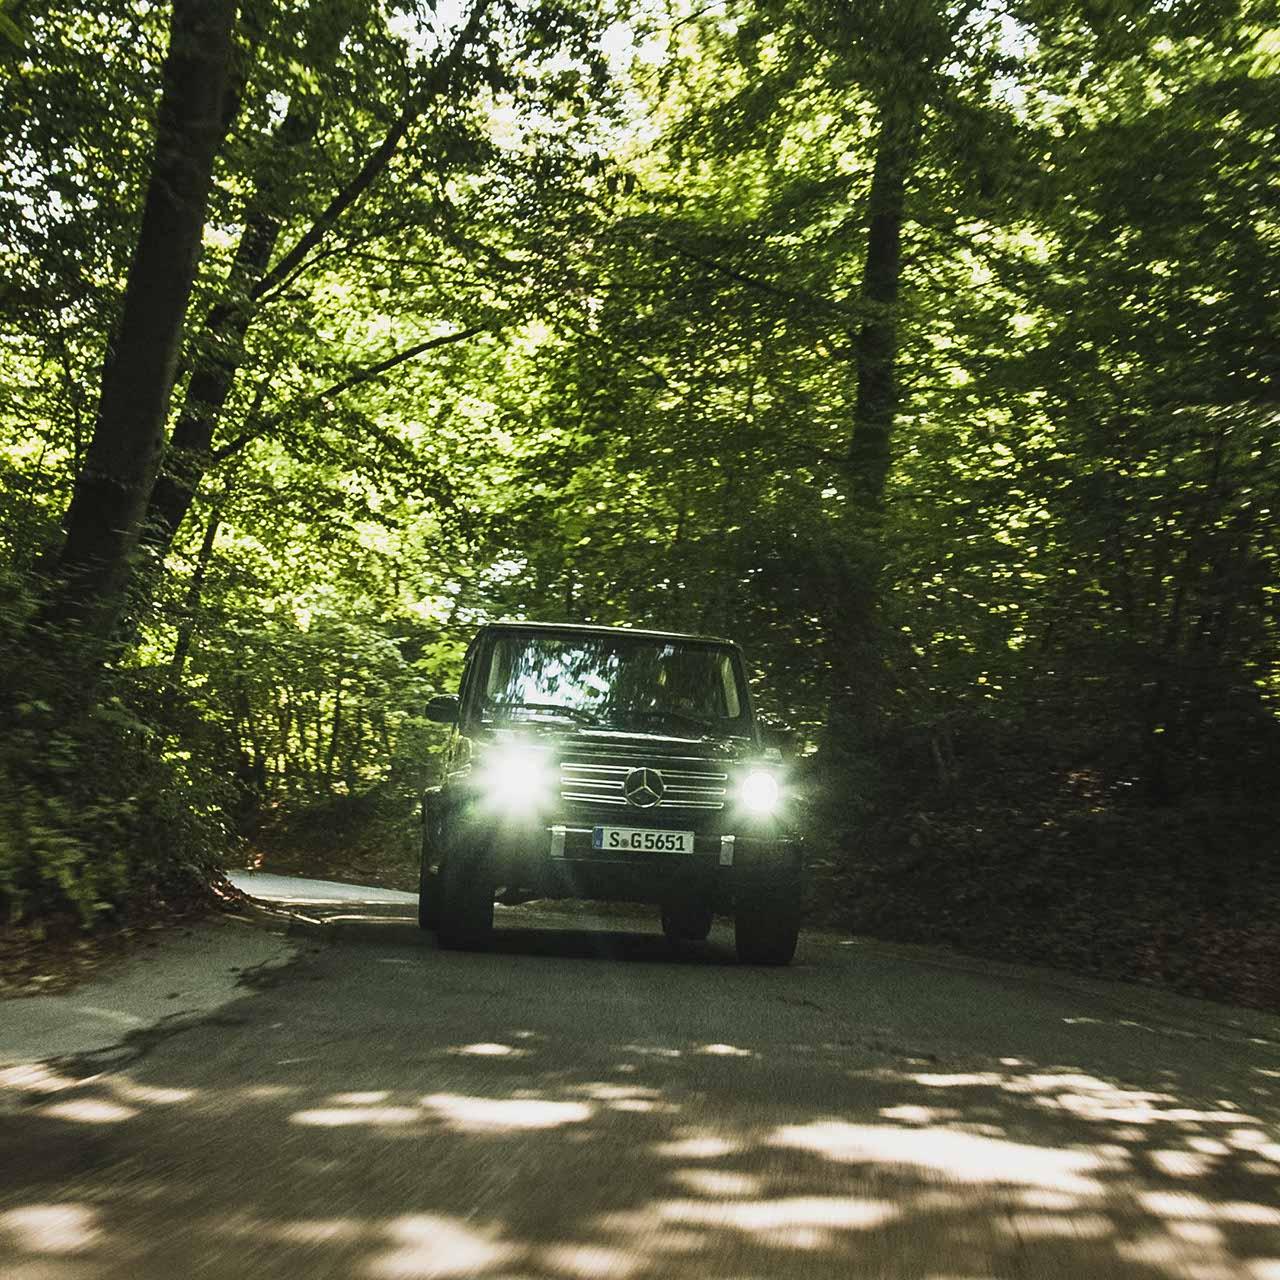 Mercedes-Benz G-Klasse im Wald | brainstormunich media Videoproduktion Fotoproduktion Filmpoduktion Fotografie München Agentur Filmagentur Social Media